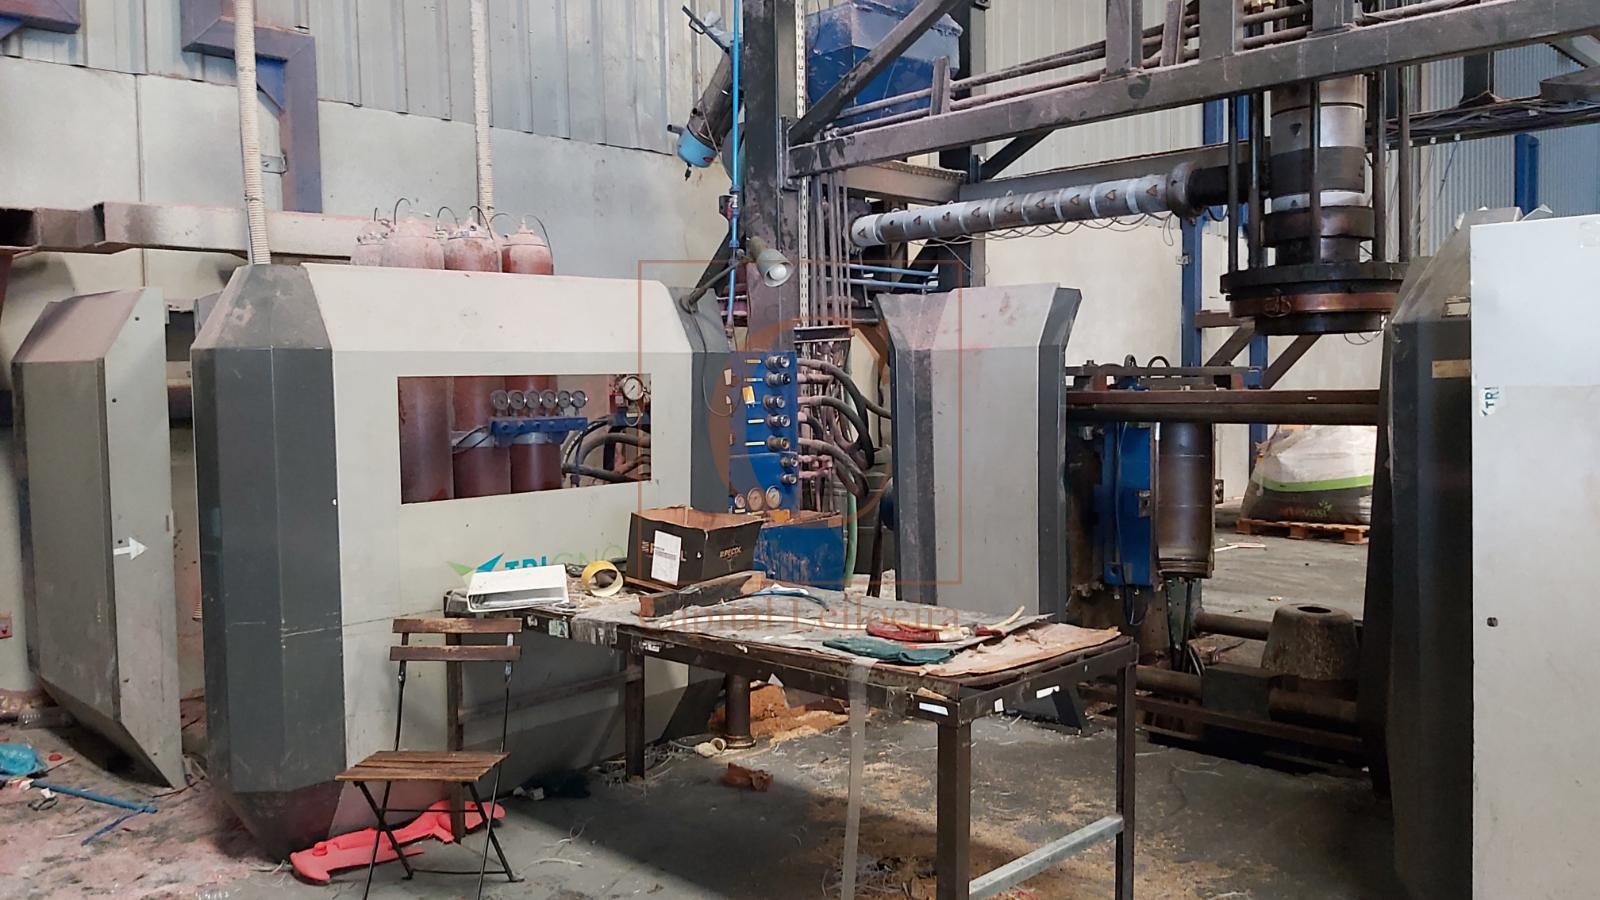 Lote 2 | Máquinas Industriais e Equipamentos | Indústria de Plásticos